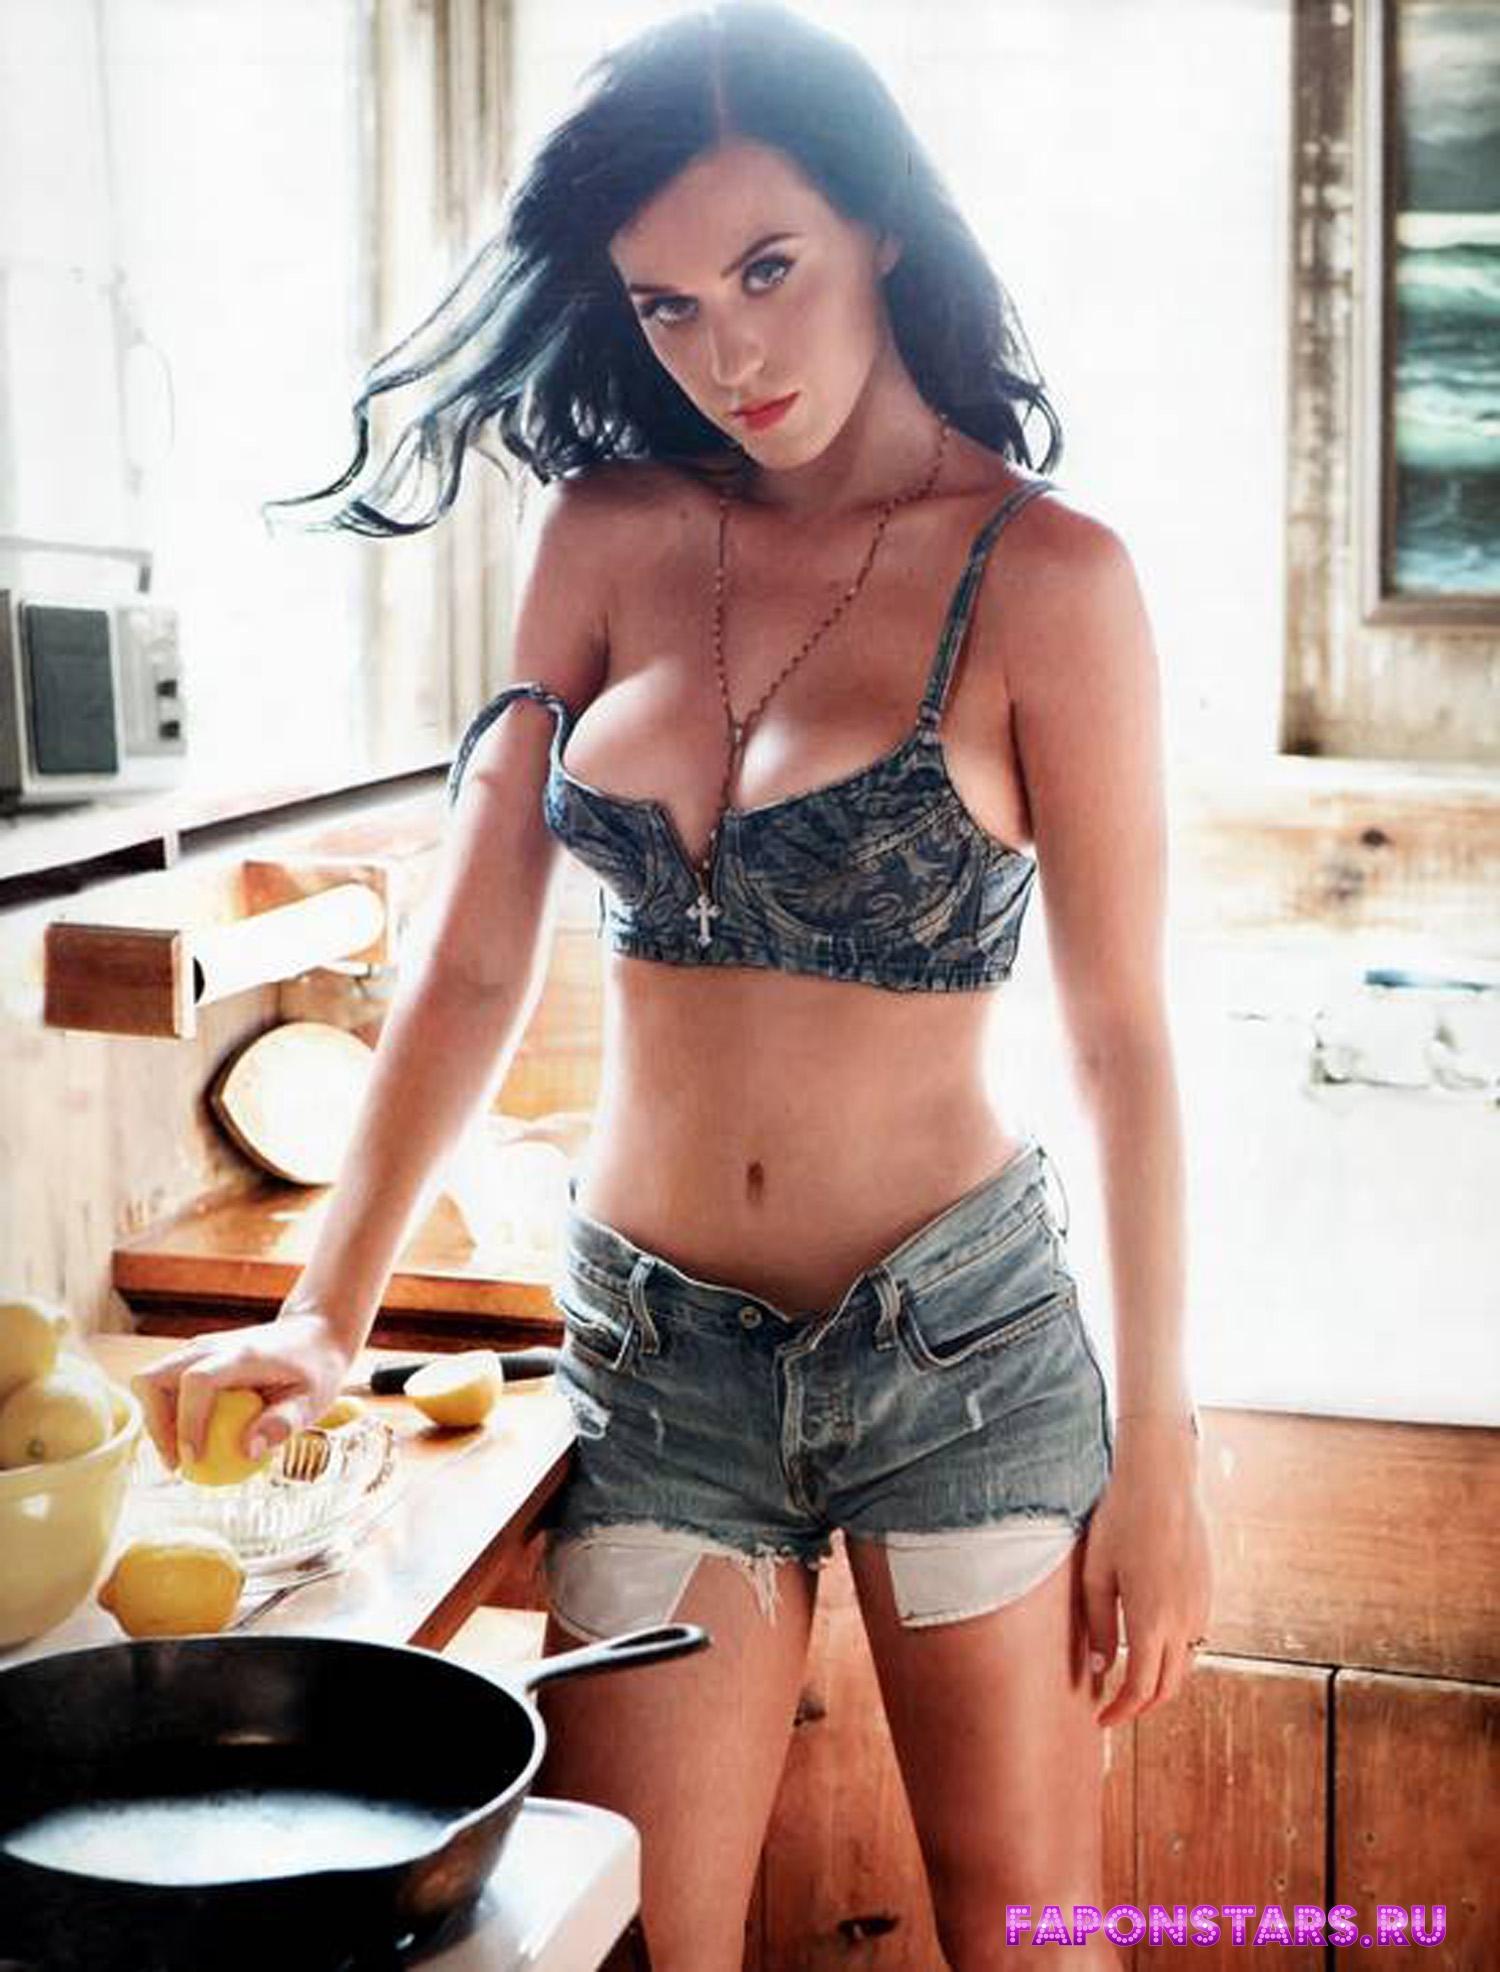 Katy Perry / Кэти Перри в дорогом красивом платье